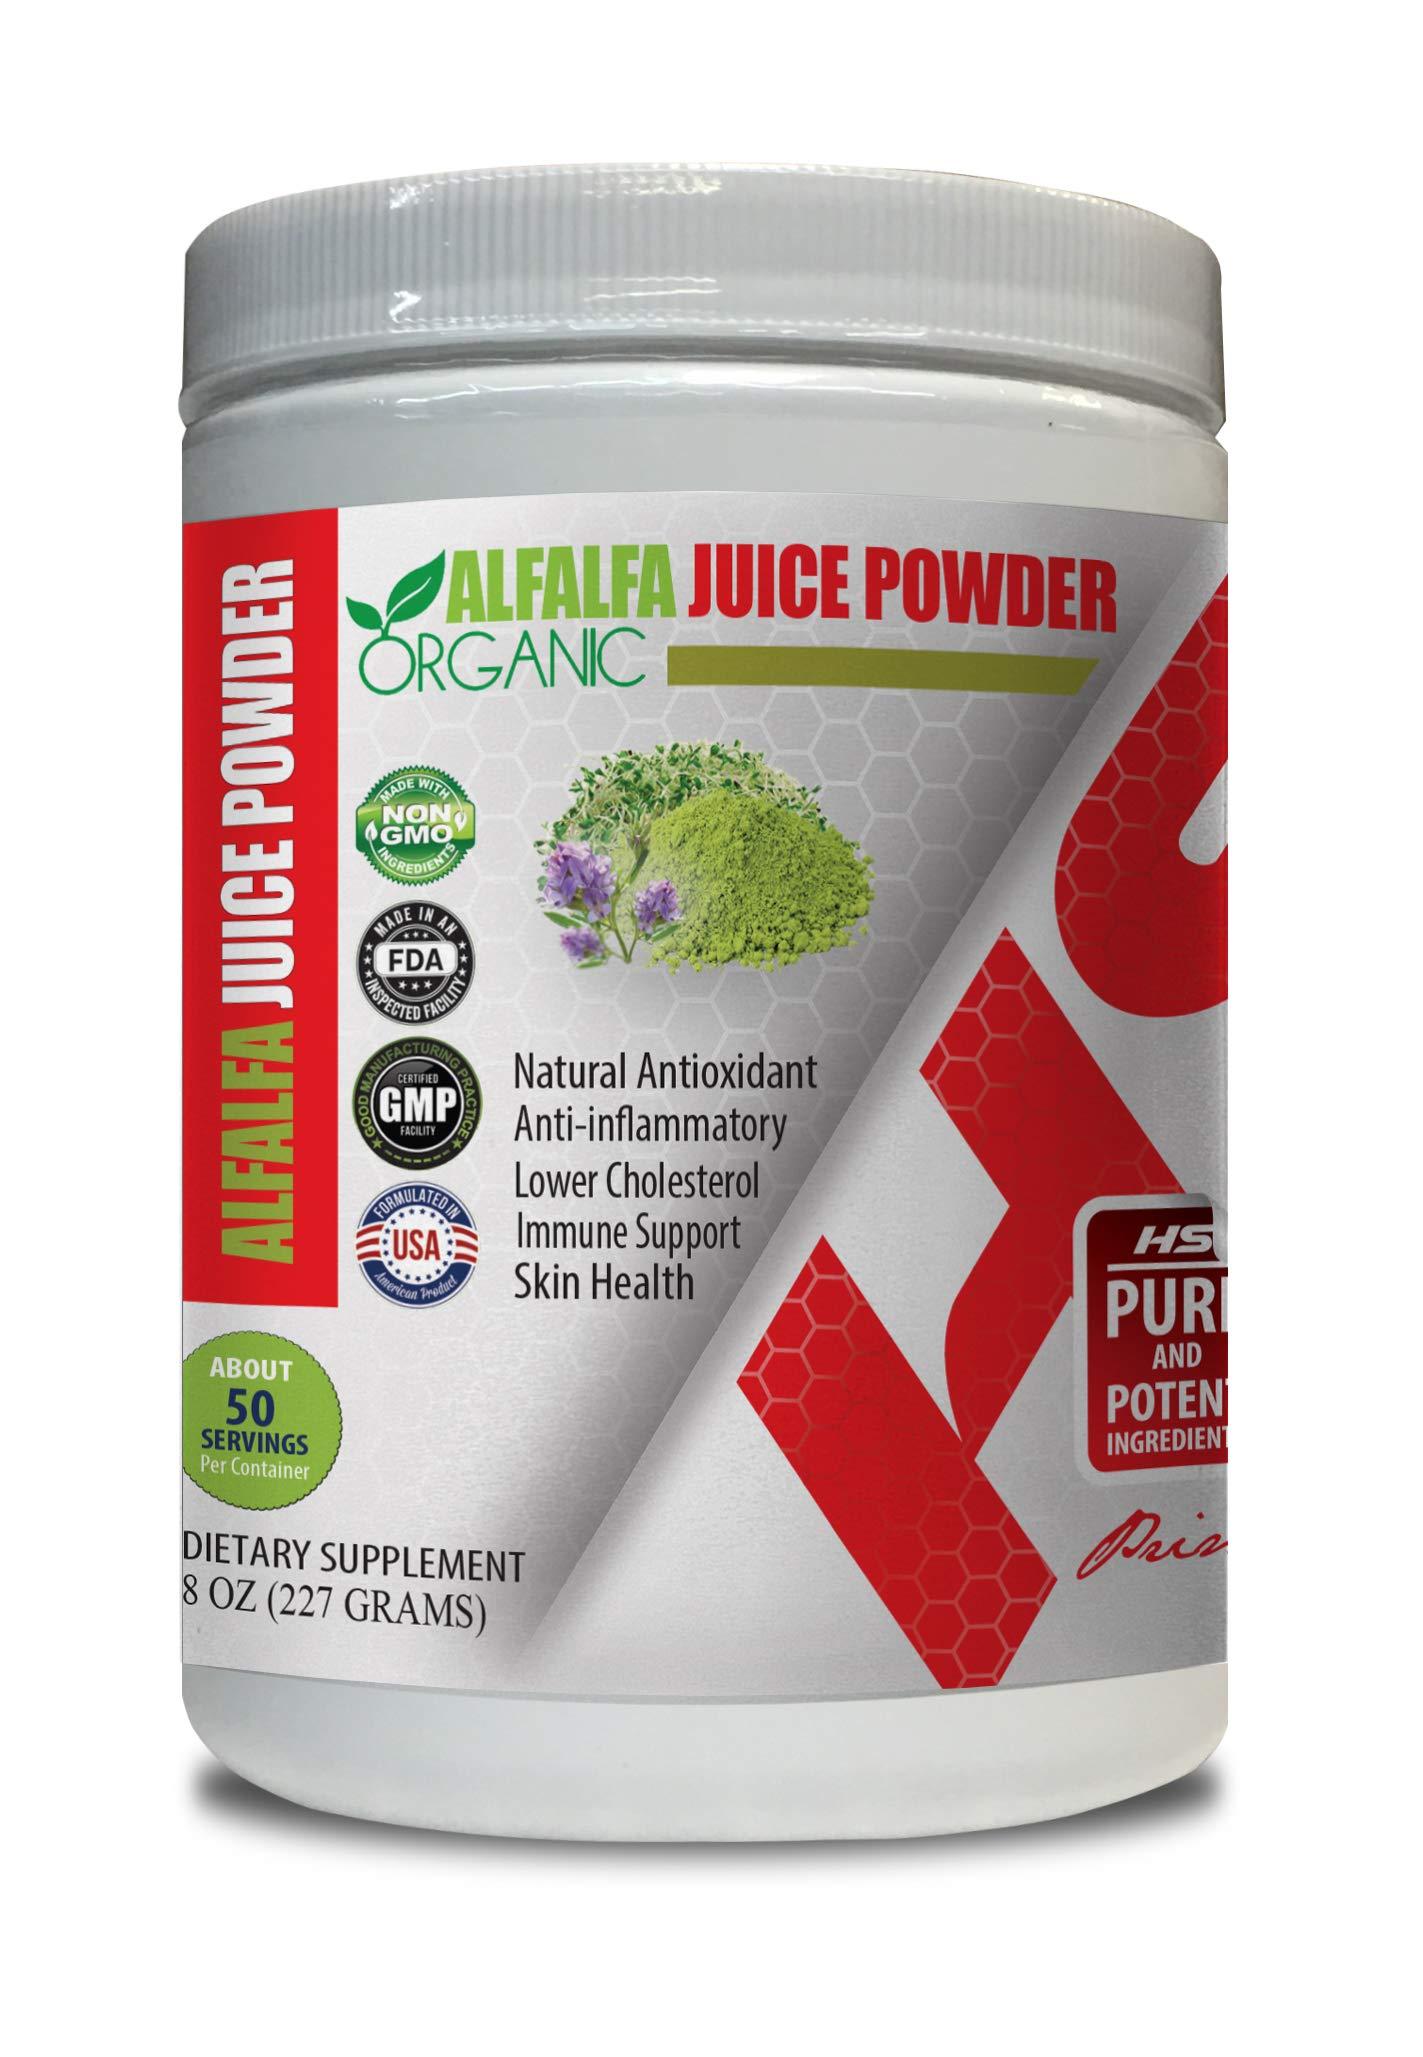 Cholesterol reducing Supplements - Alfalfa Juice Organic Powder - Alfalfa Extract - 1 Can 8 OZ (50 Servings)